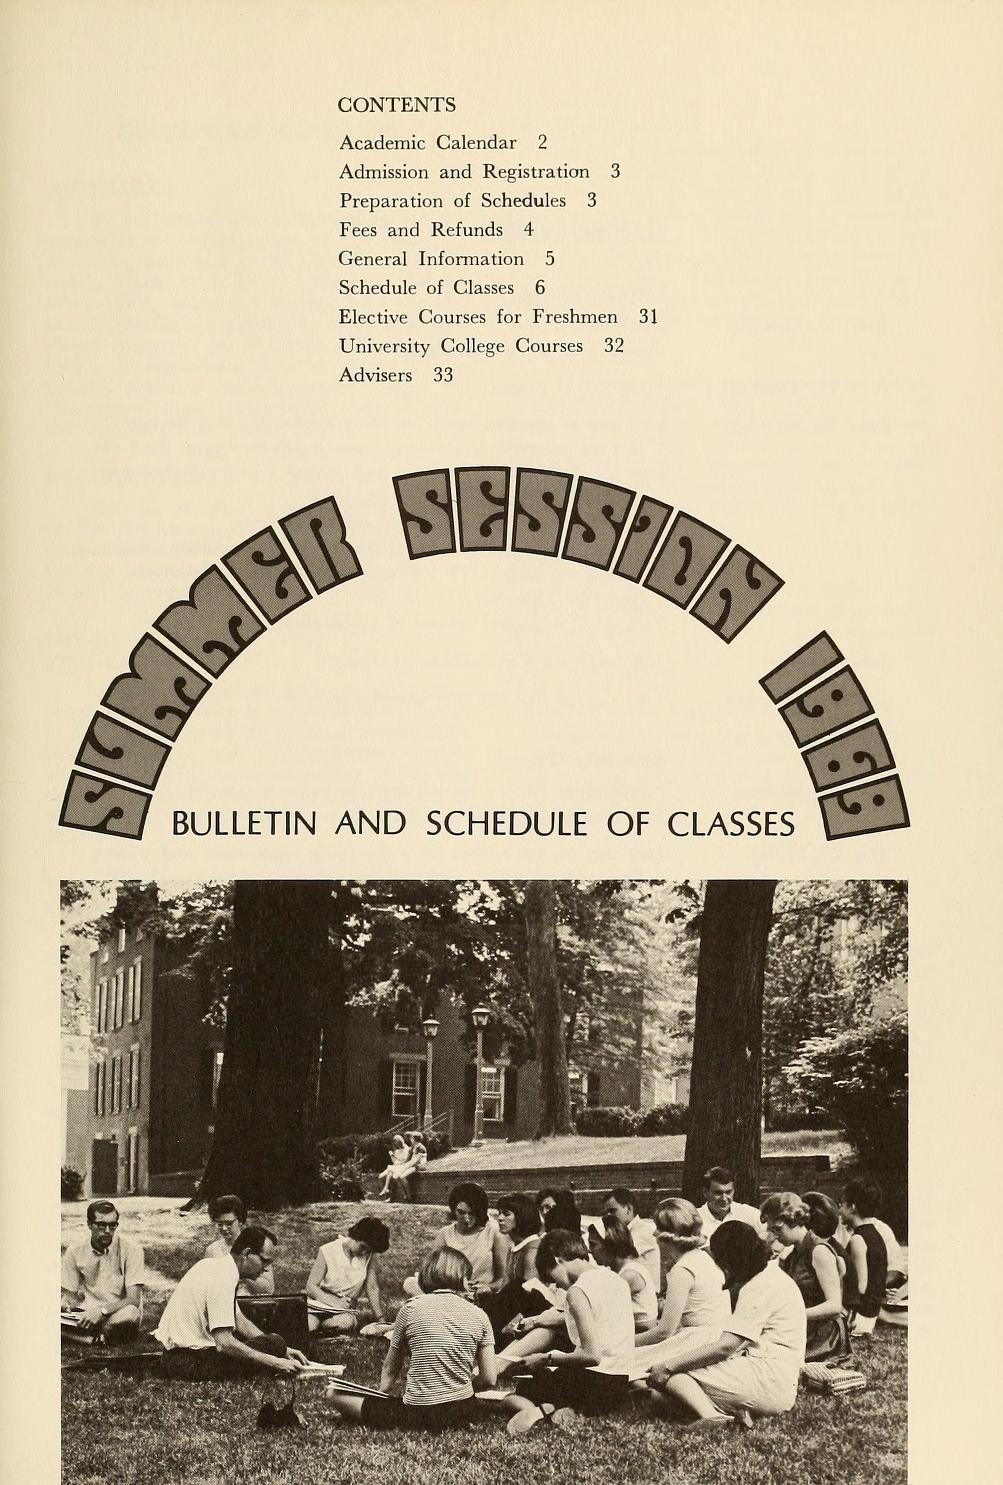 Ohio University Academic Calendar.Ohio University Bulletin Summer School 1969 Summer Session 1969